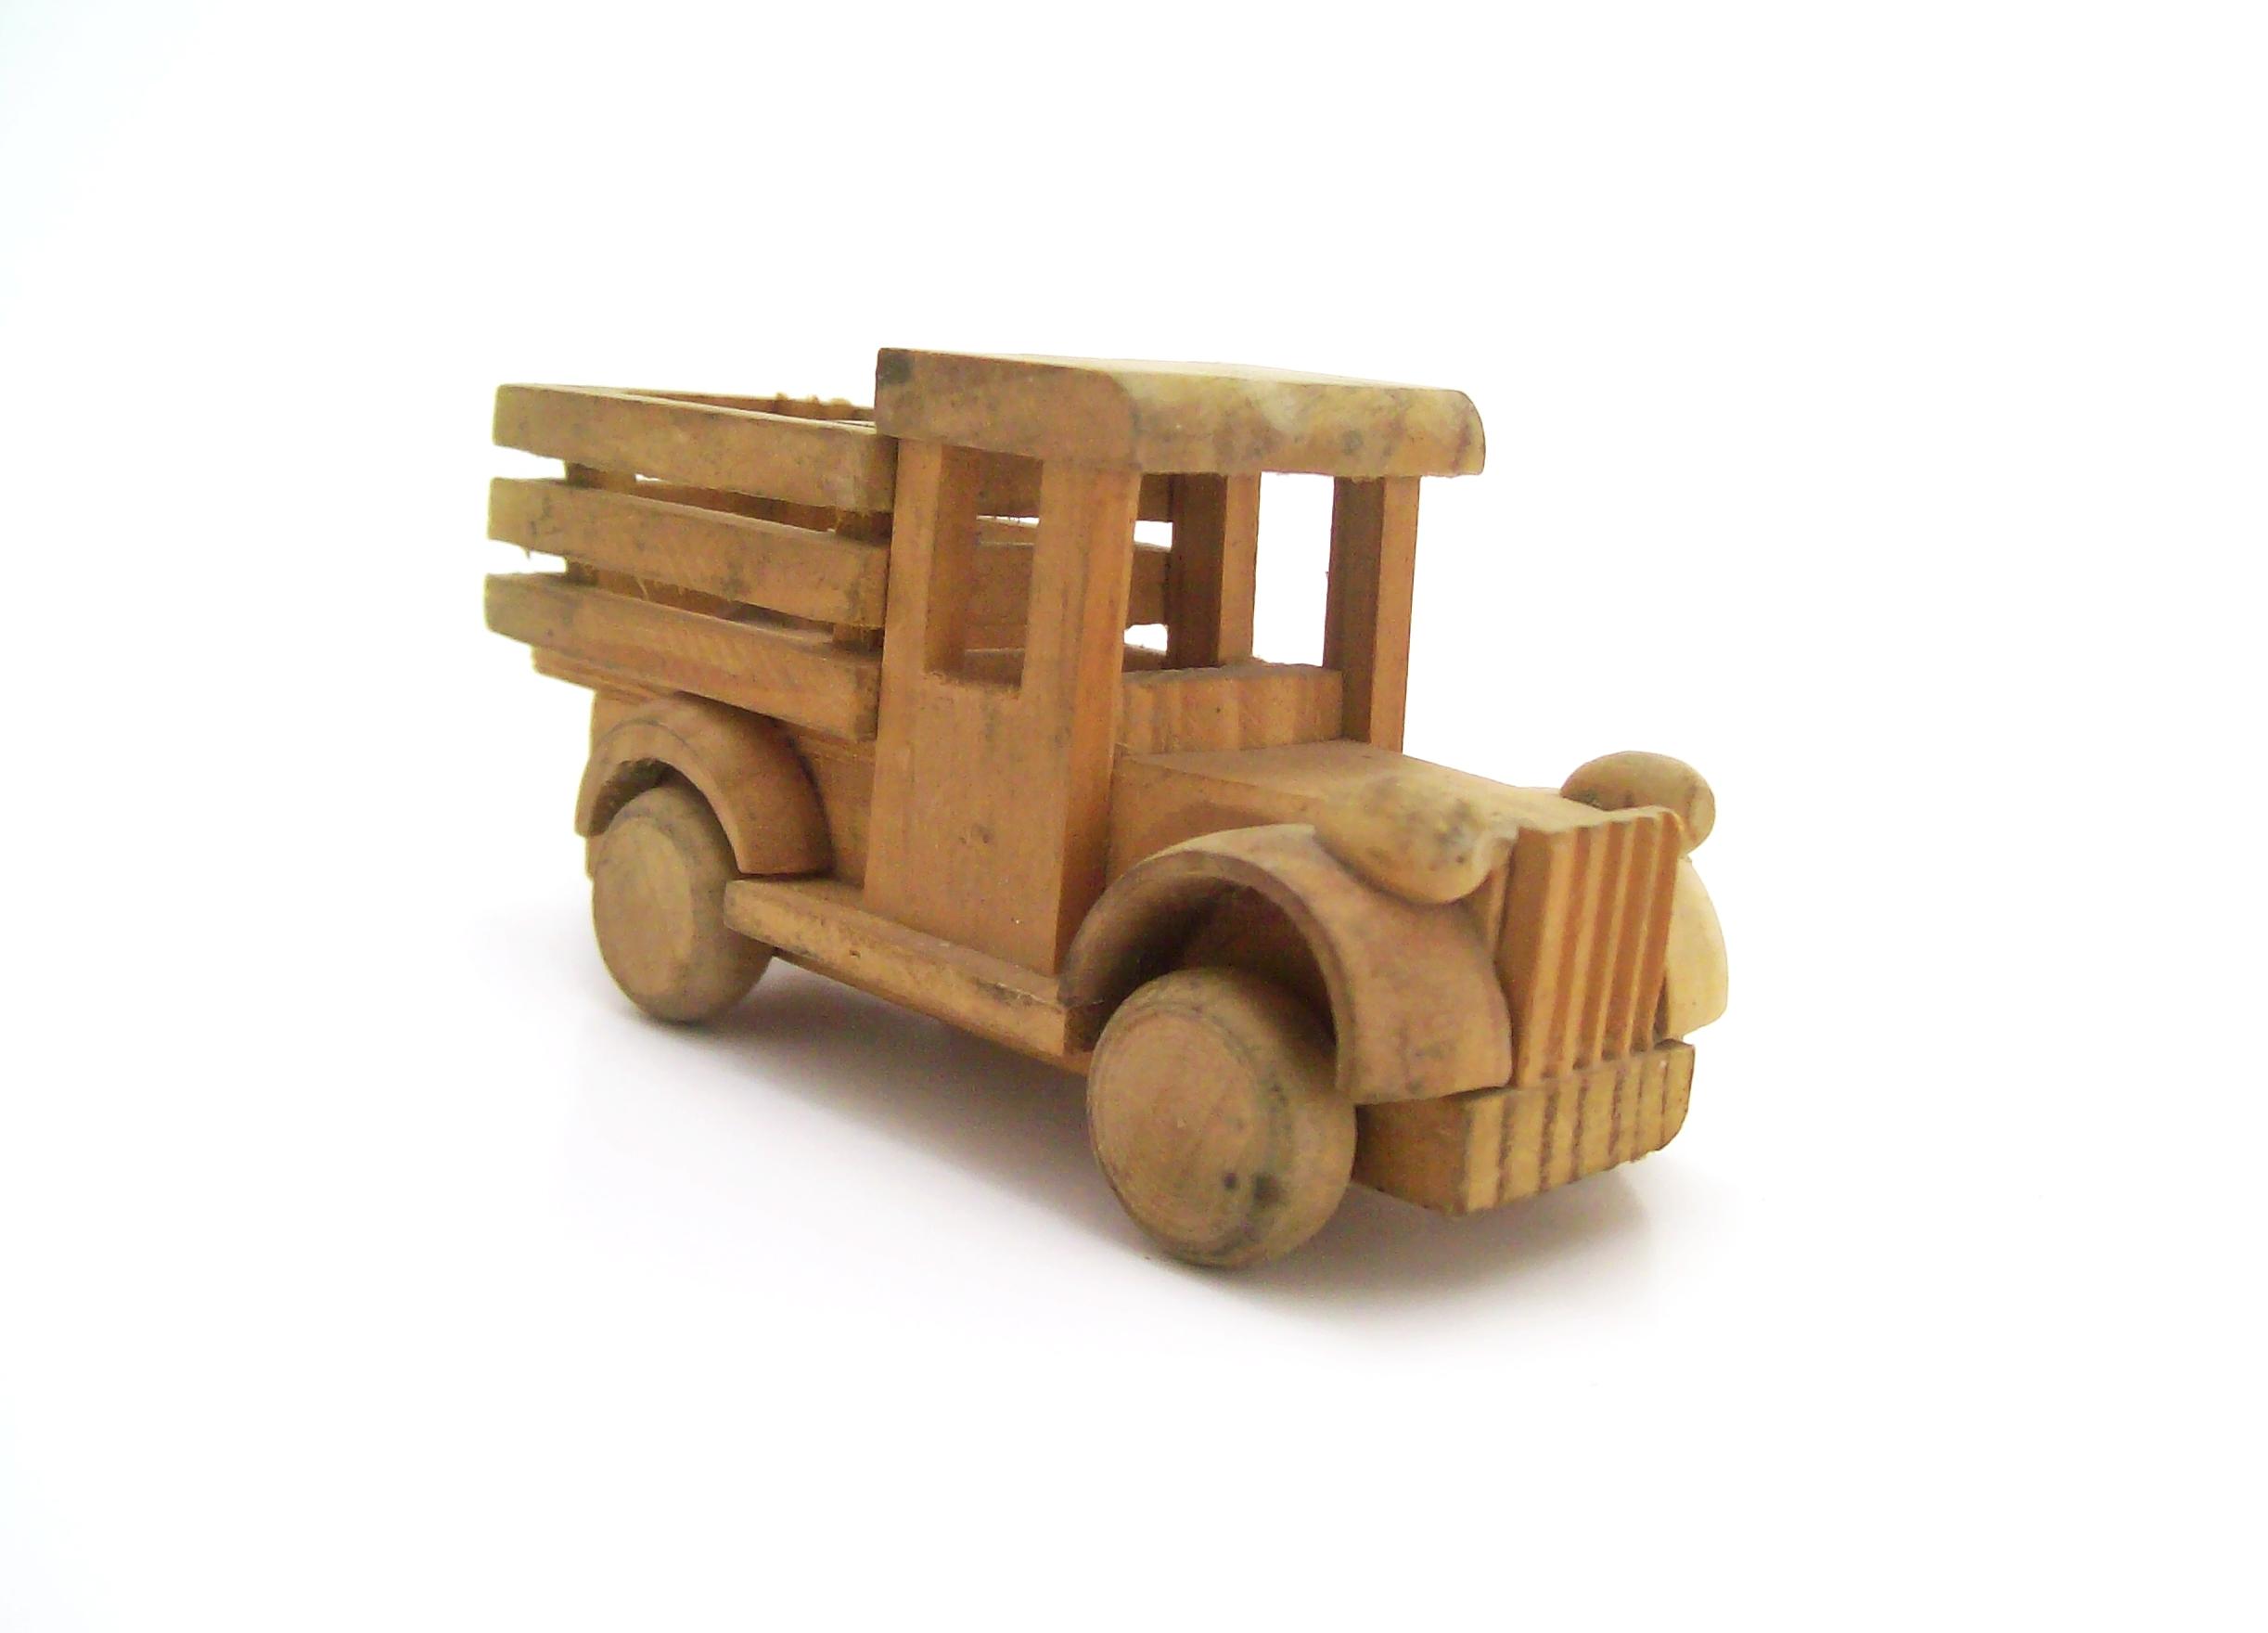 Wooden truck photo